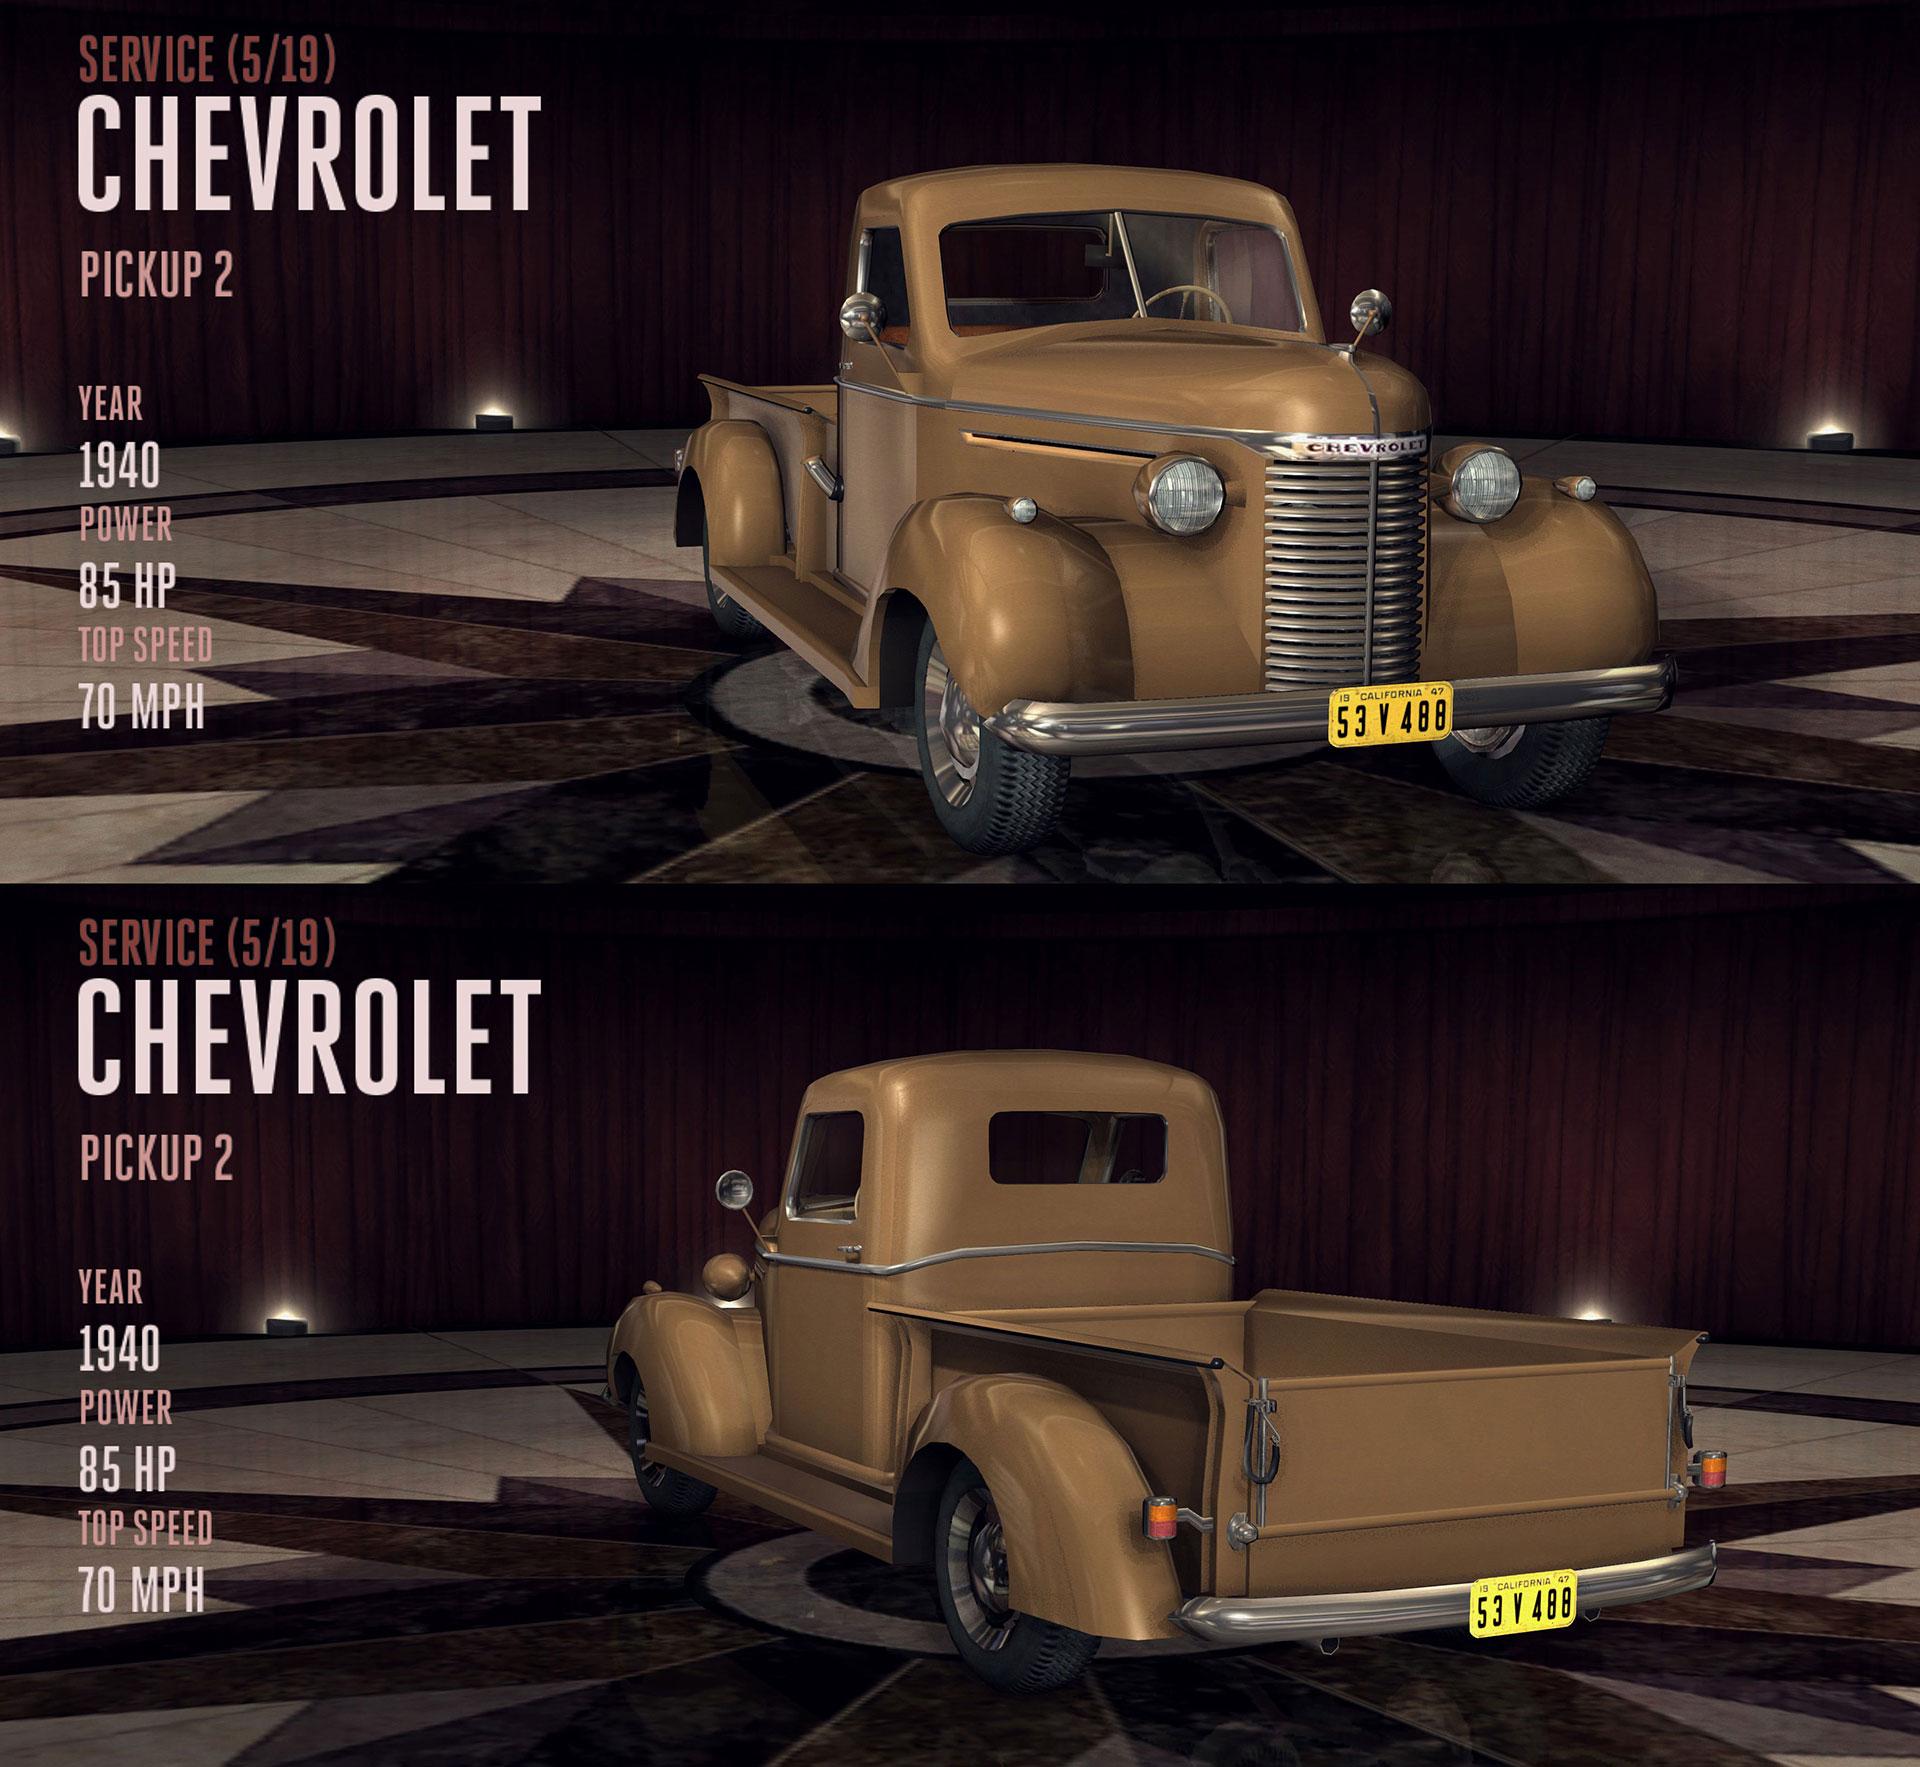 File:1940-chevrolet-pickup-2.jpg